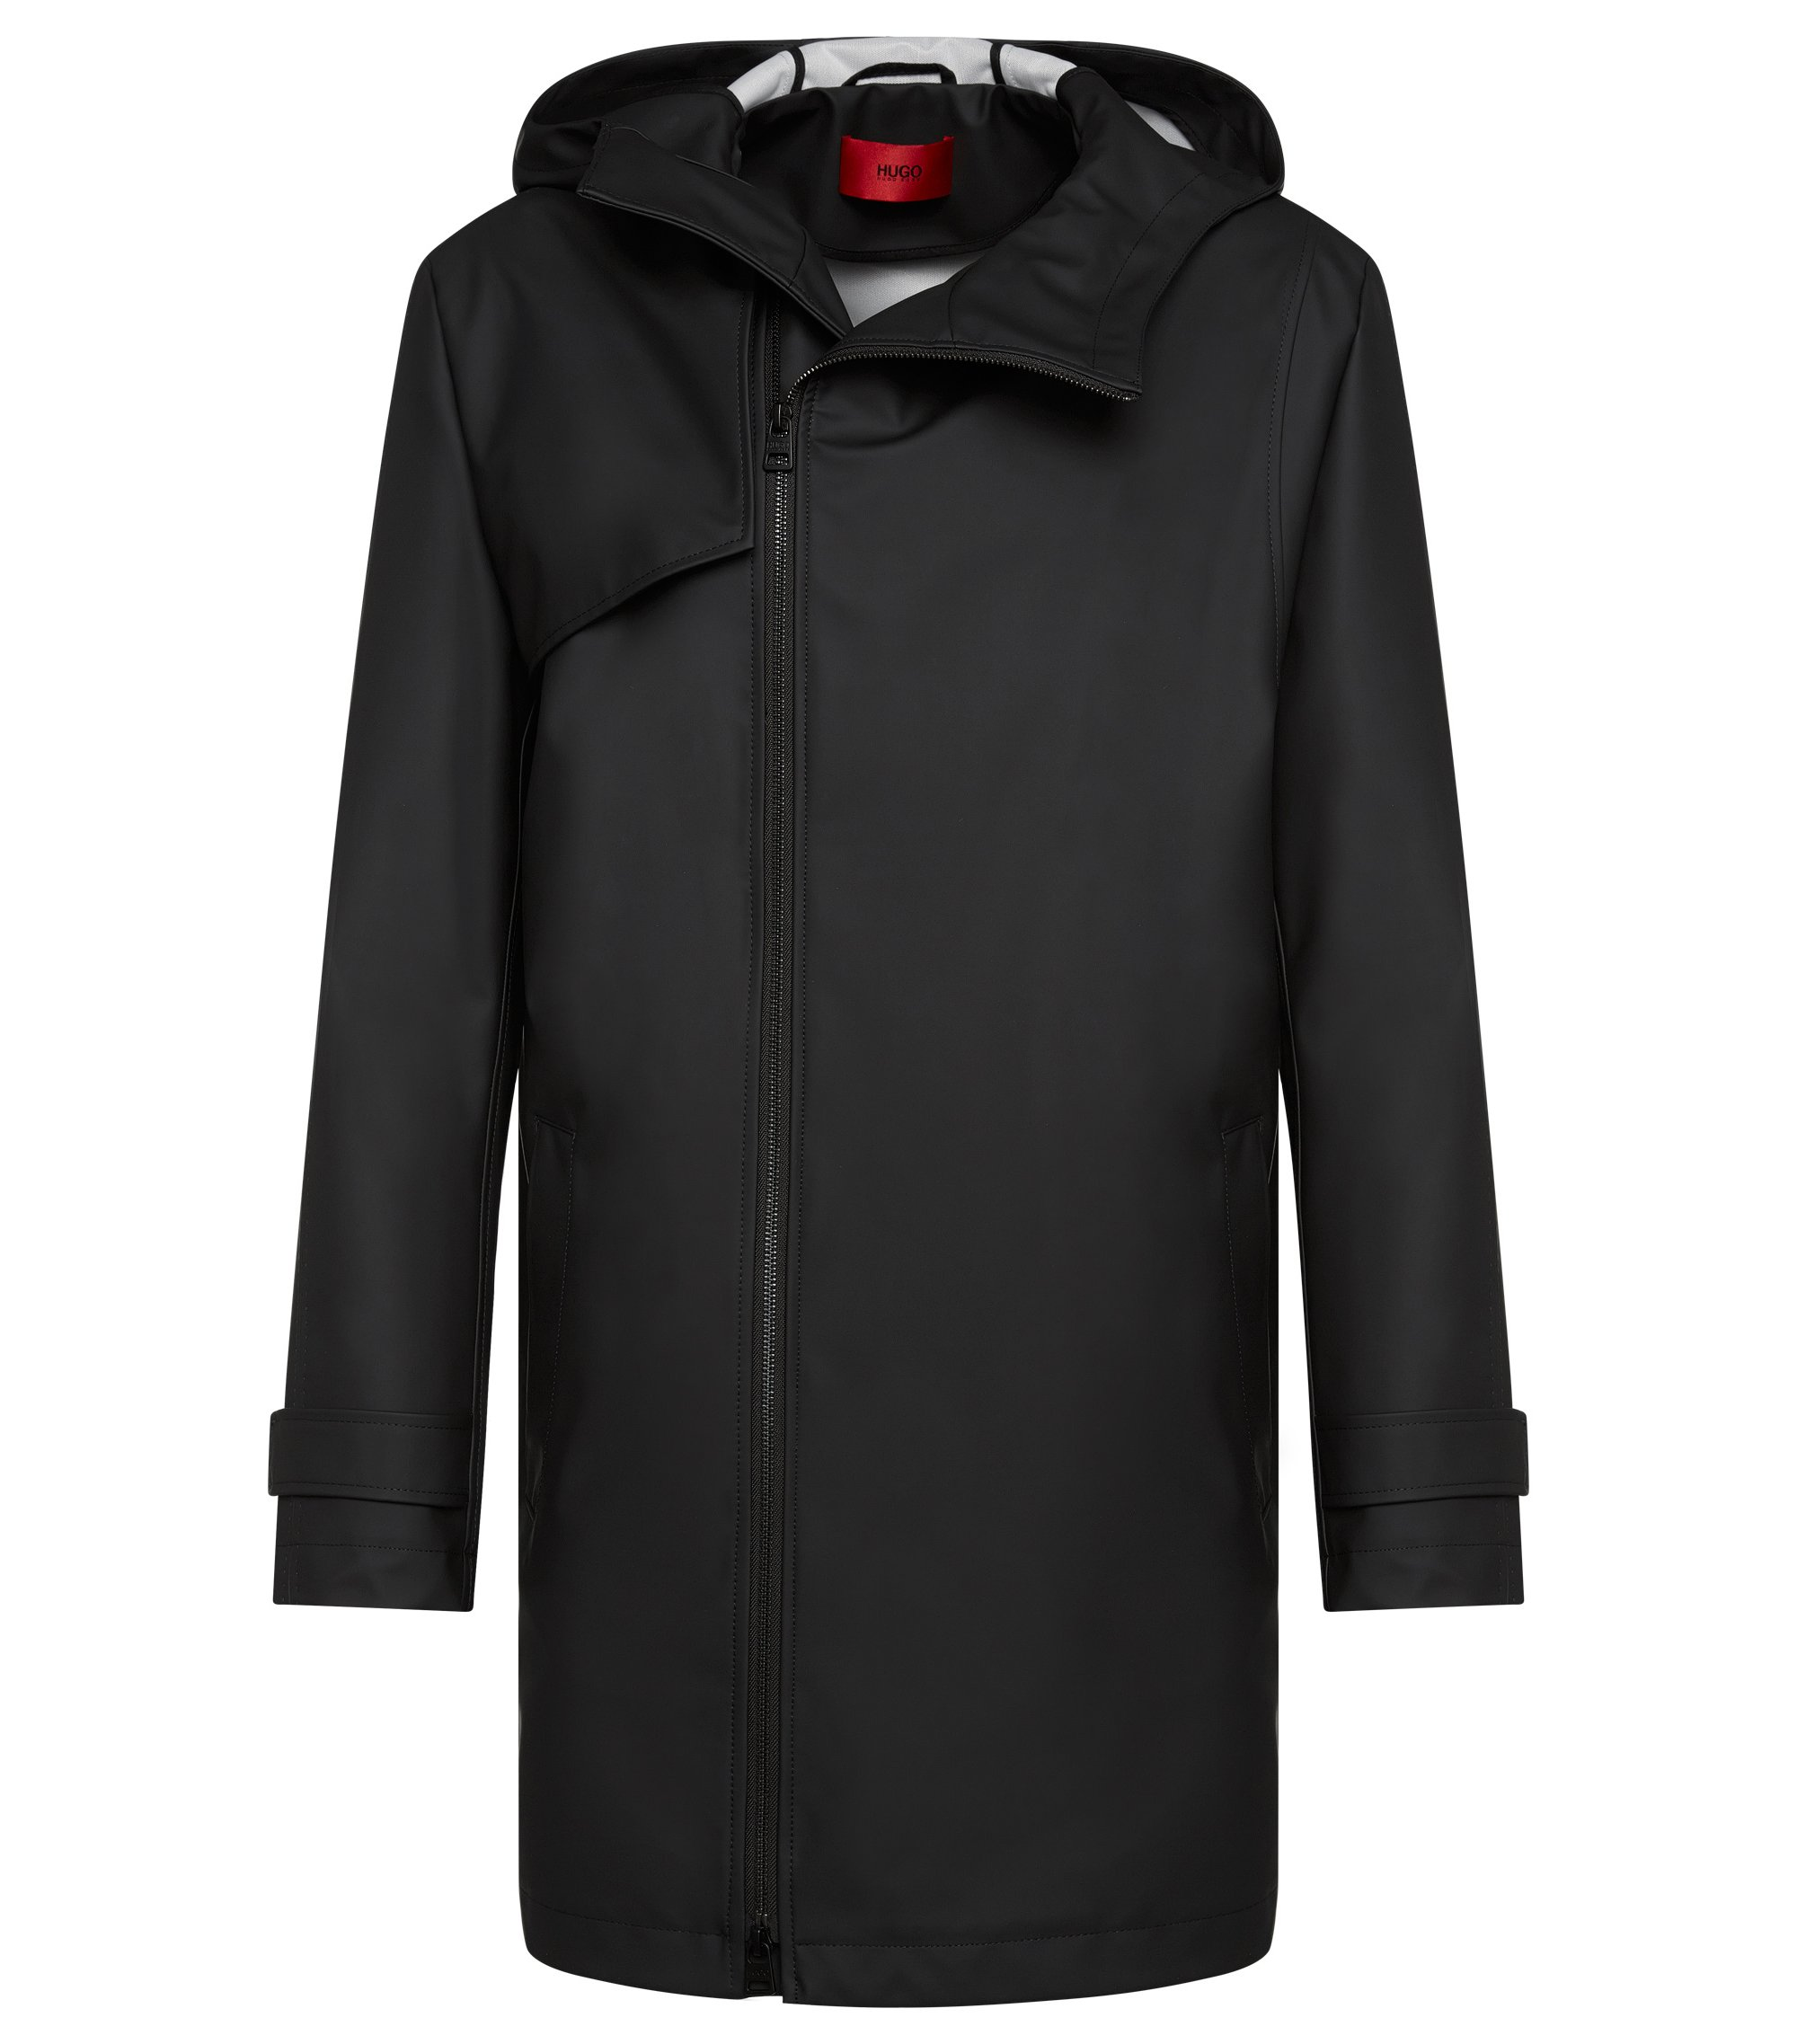 Water Repellent Hooded Rain Coat | Menoz, Black